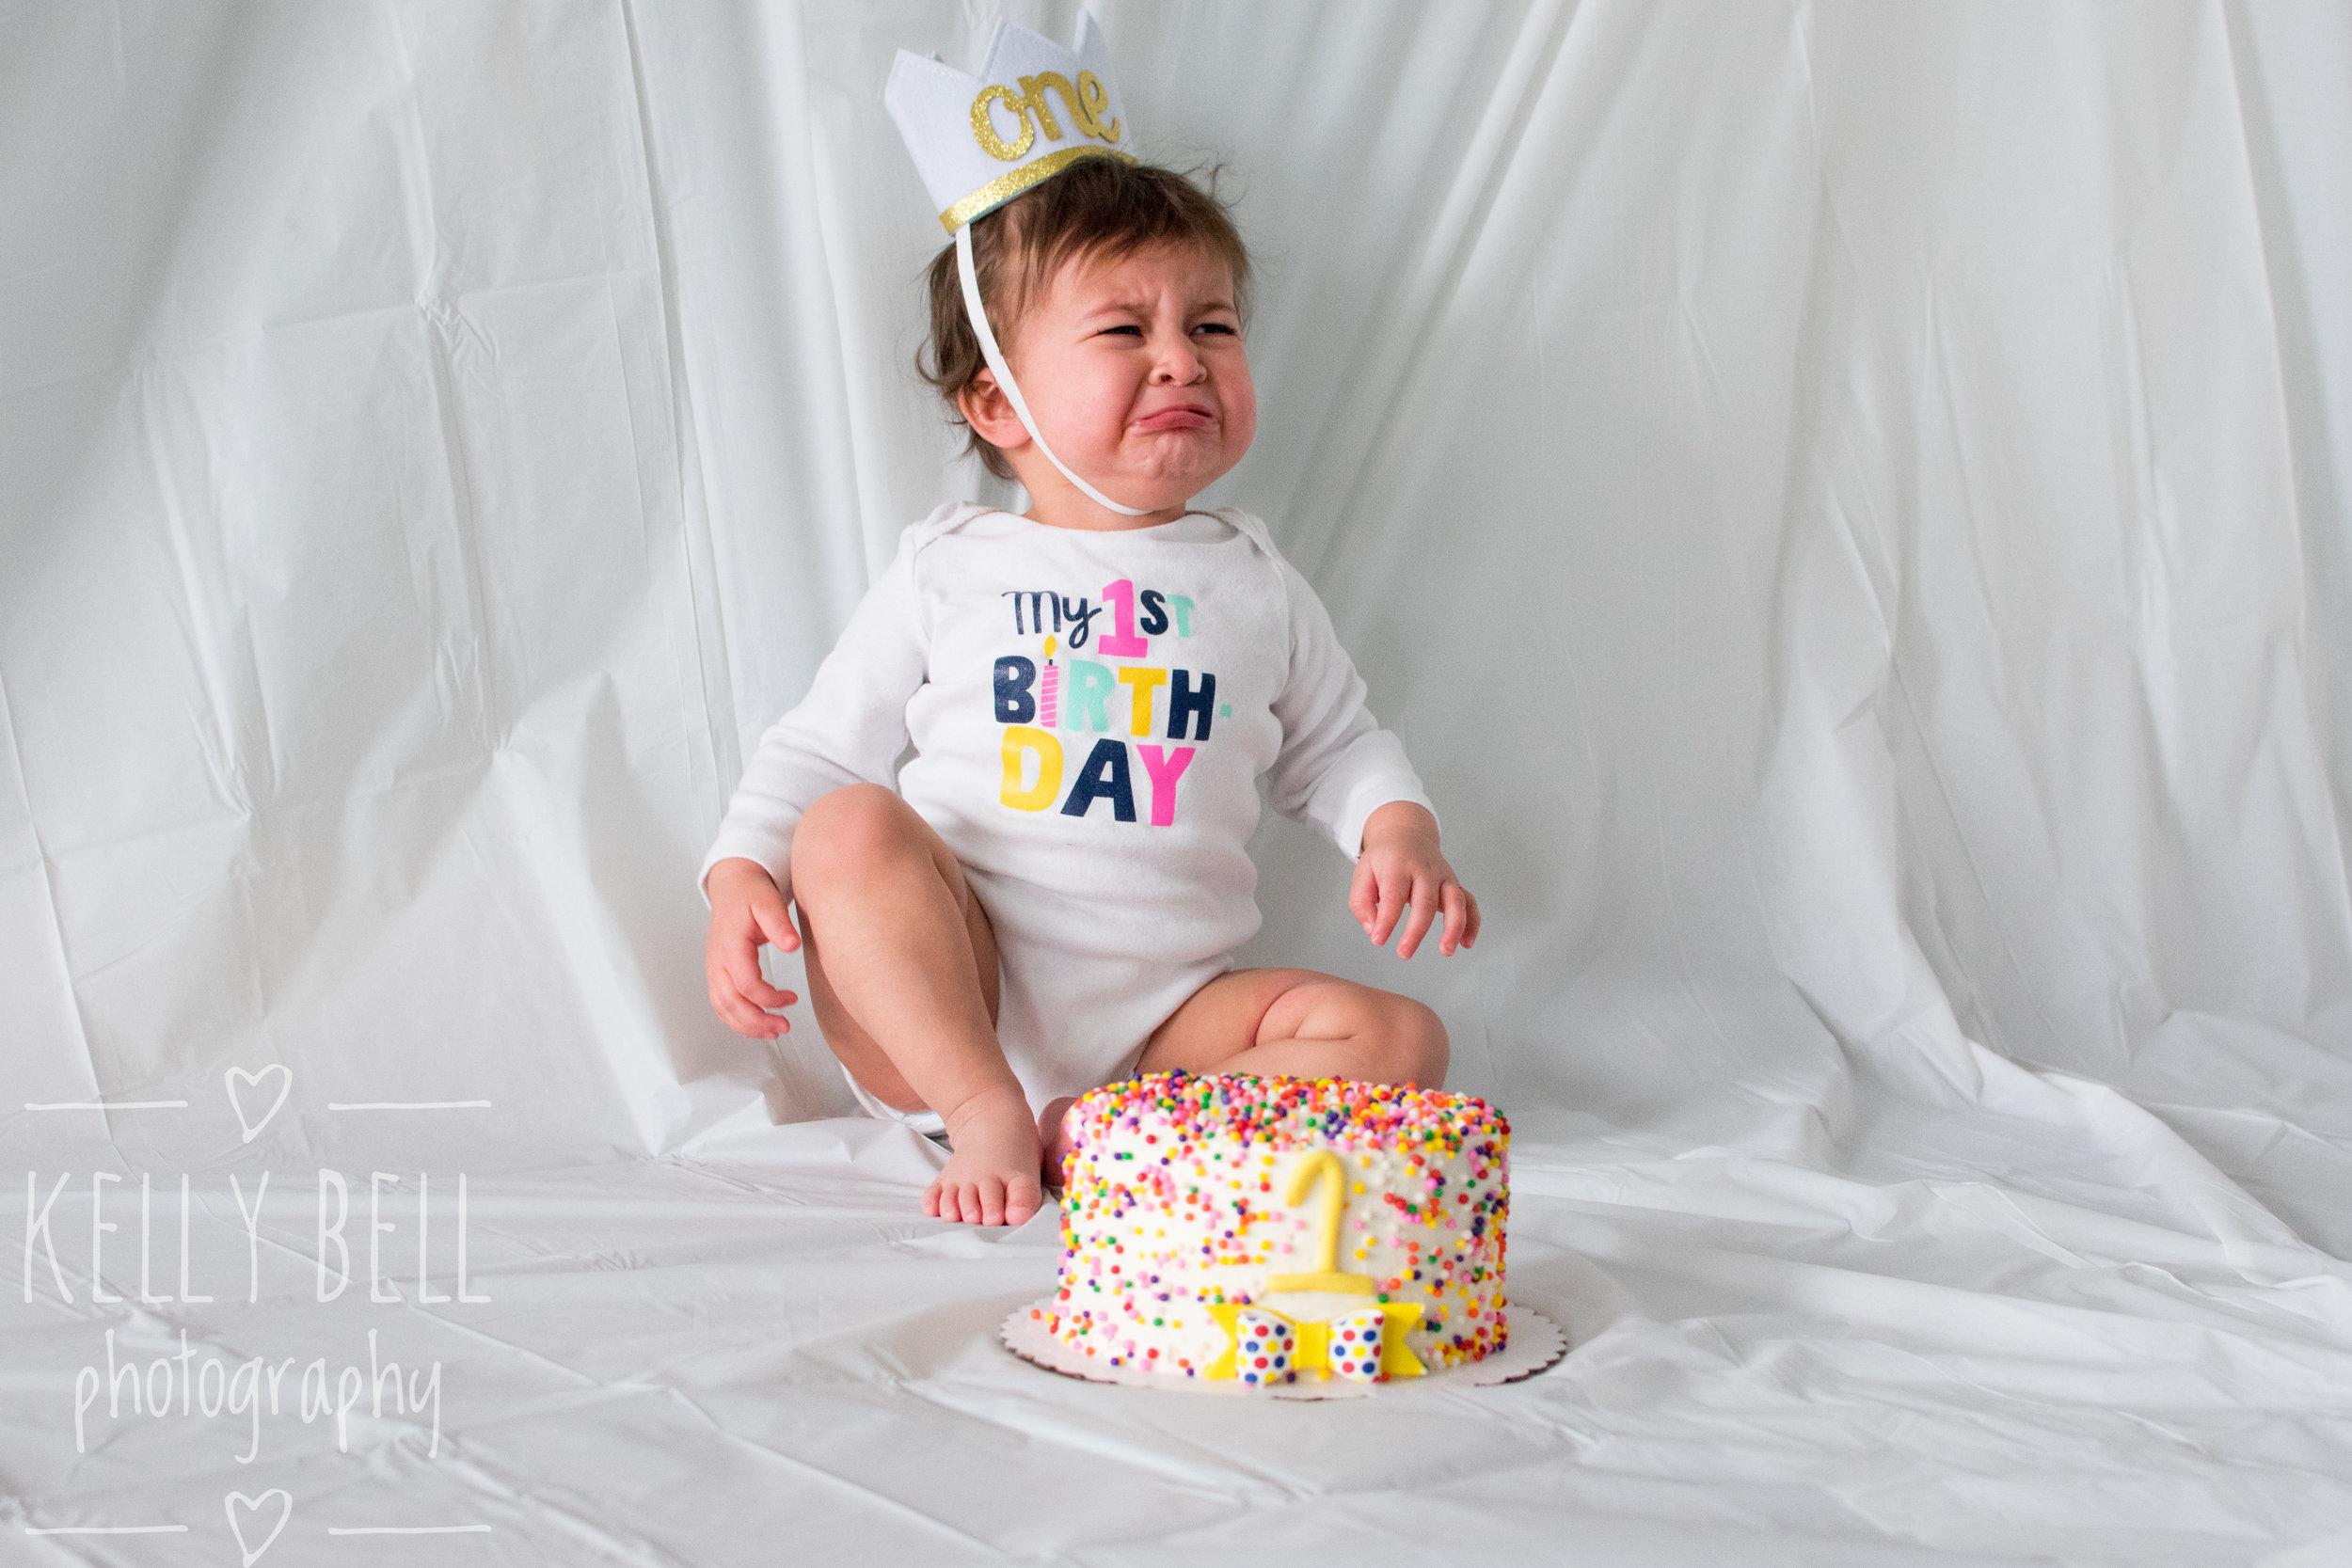 20171210 Cake Smash - 1.jpg